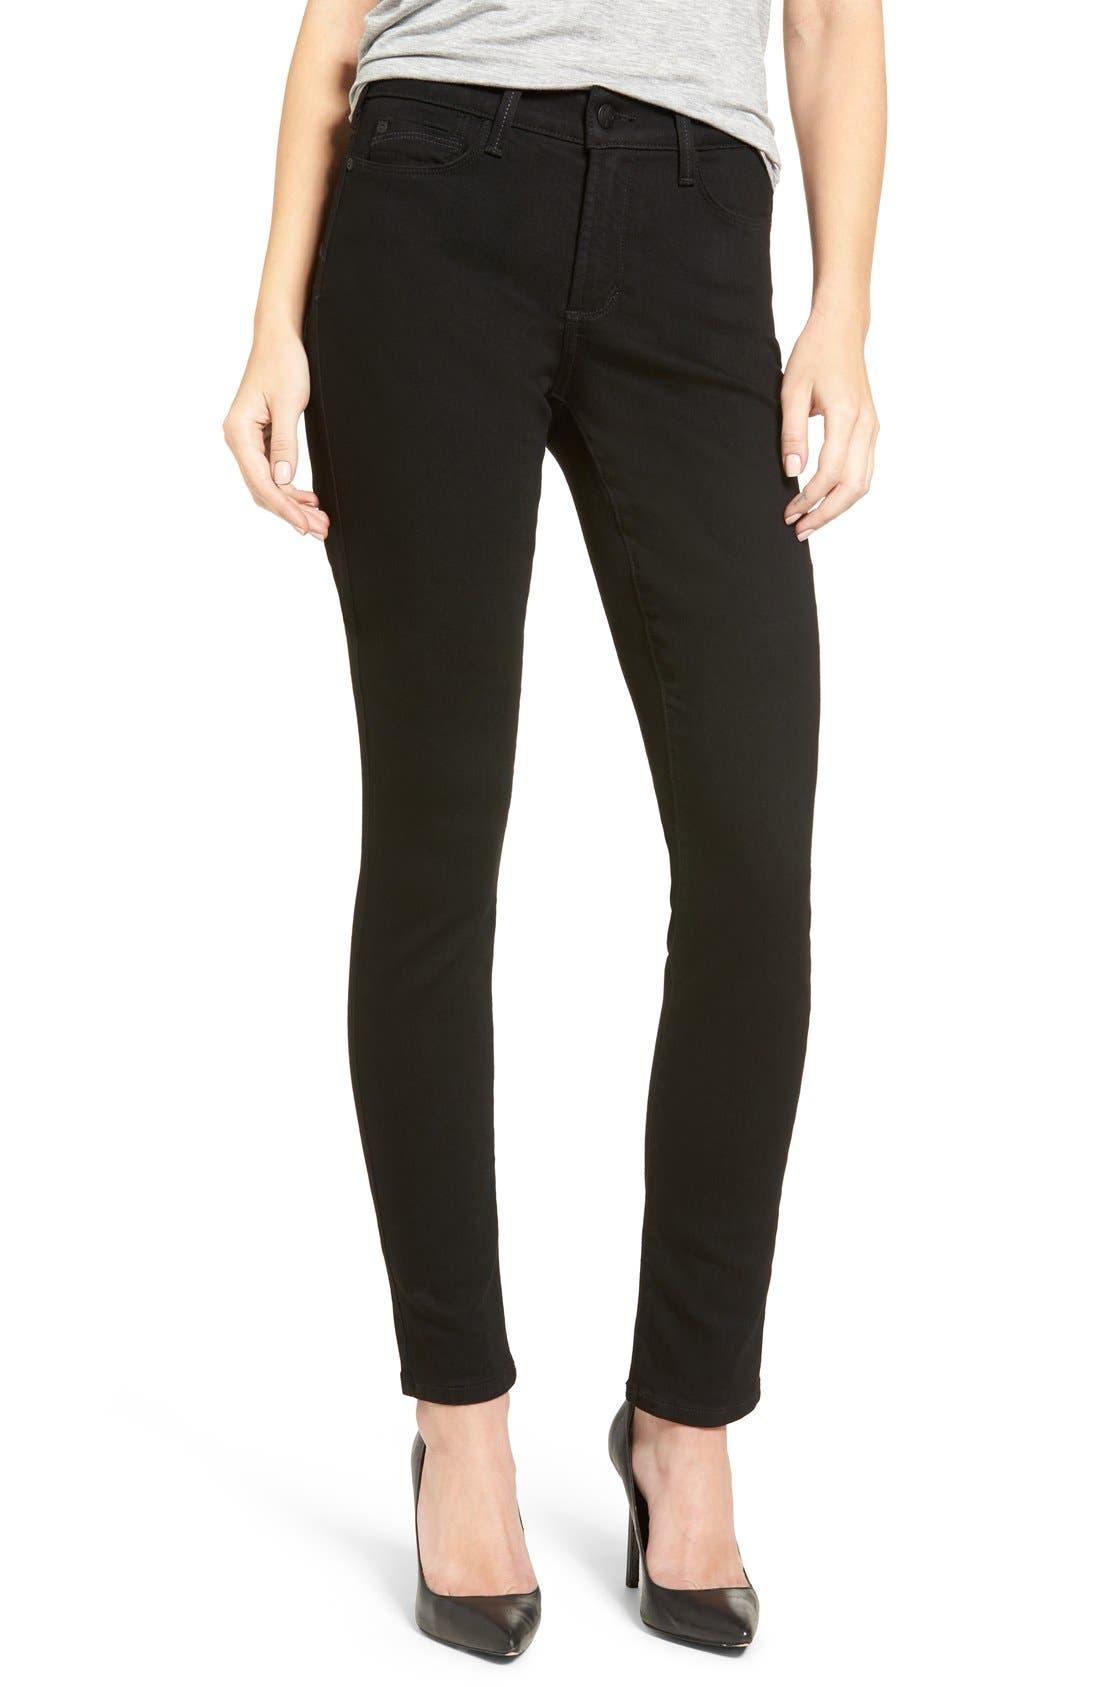 NYDJ Alina Uplift Stretch Skinny Jeans